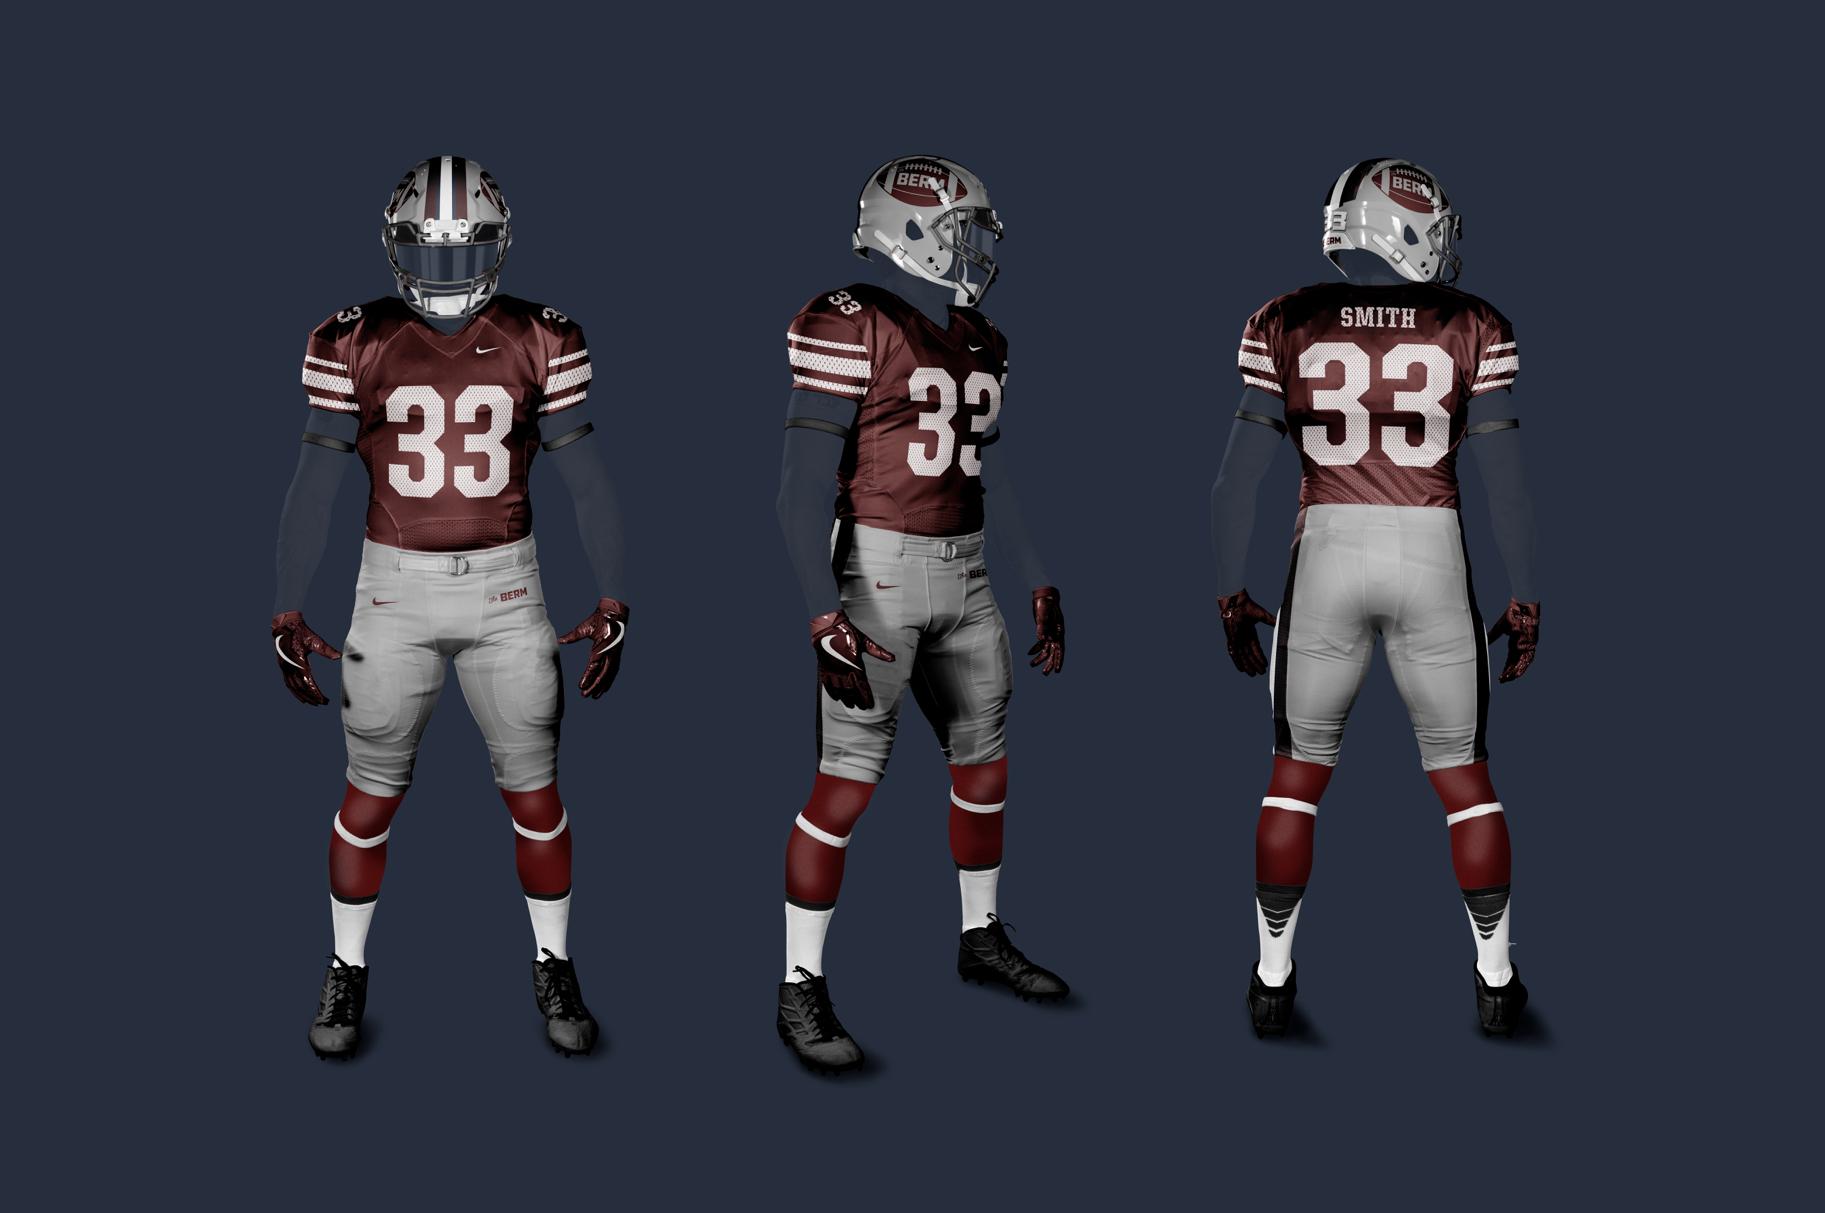 Home football uniform